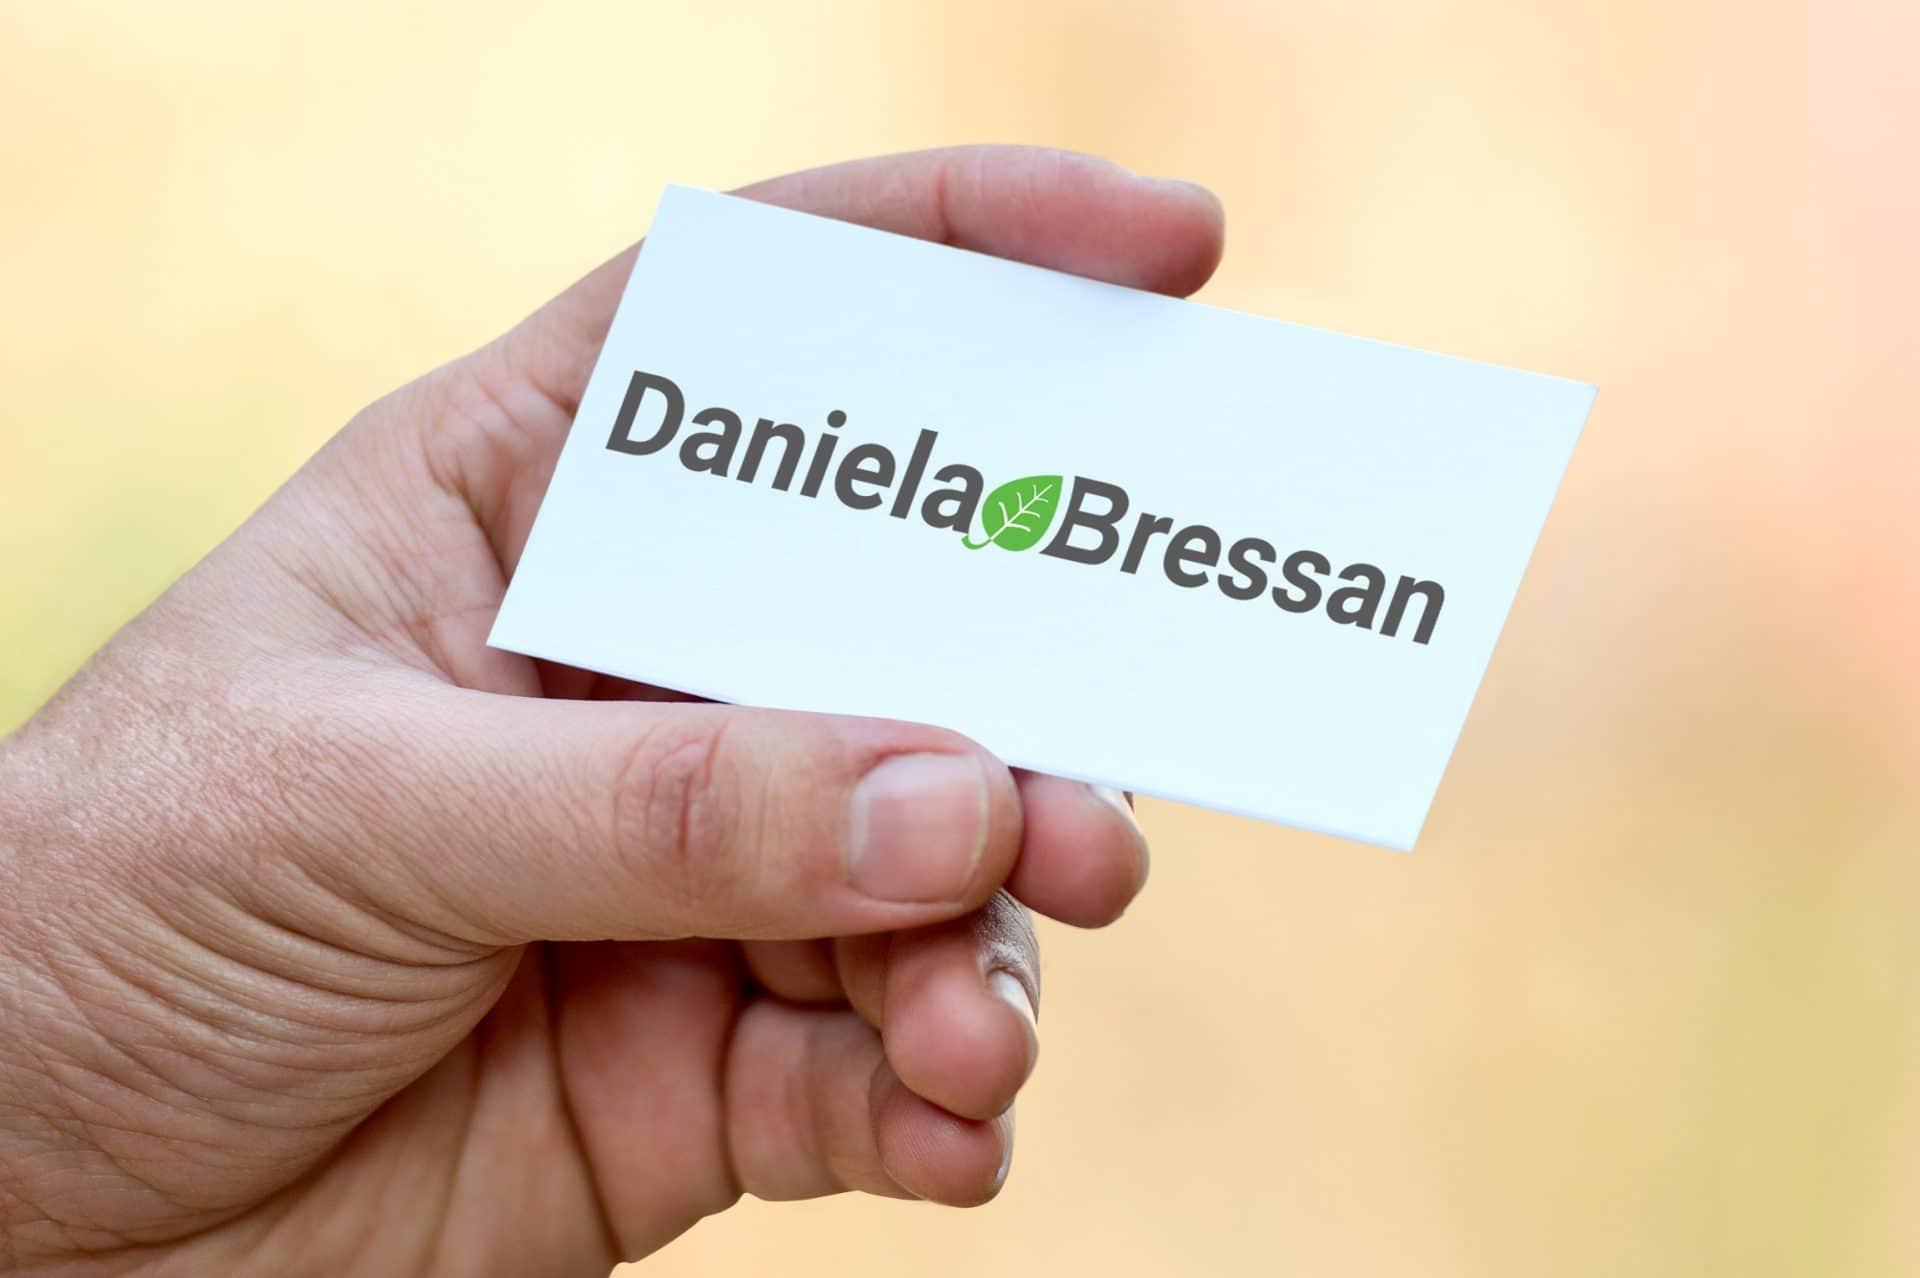 - Logo Daniela Bresson - Logo Daniela Bressan